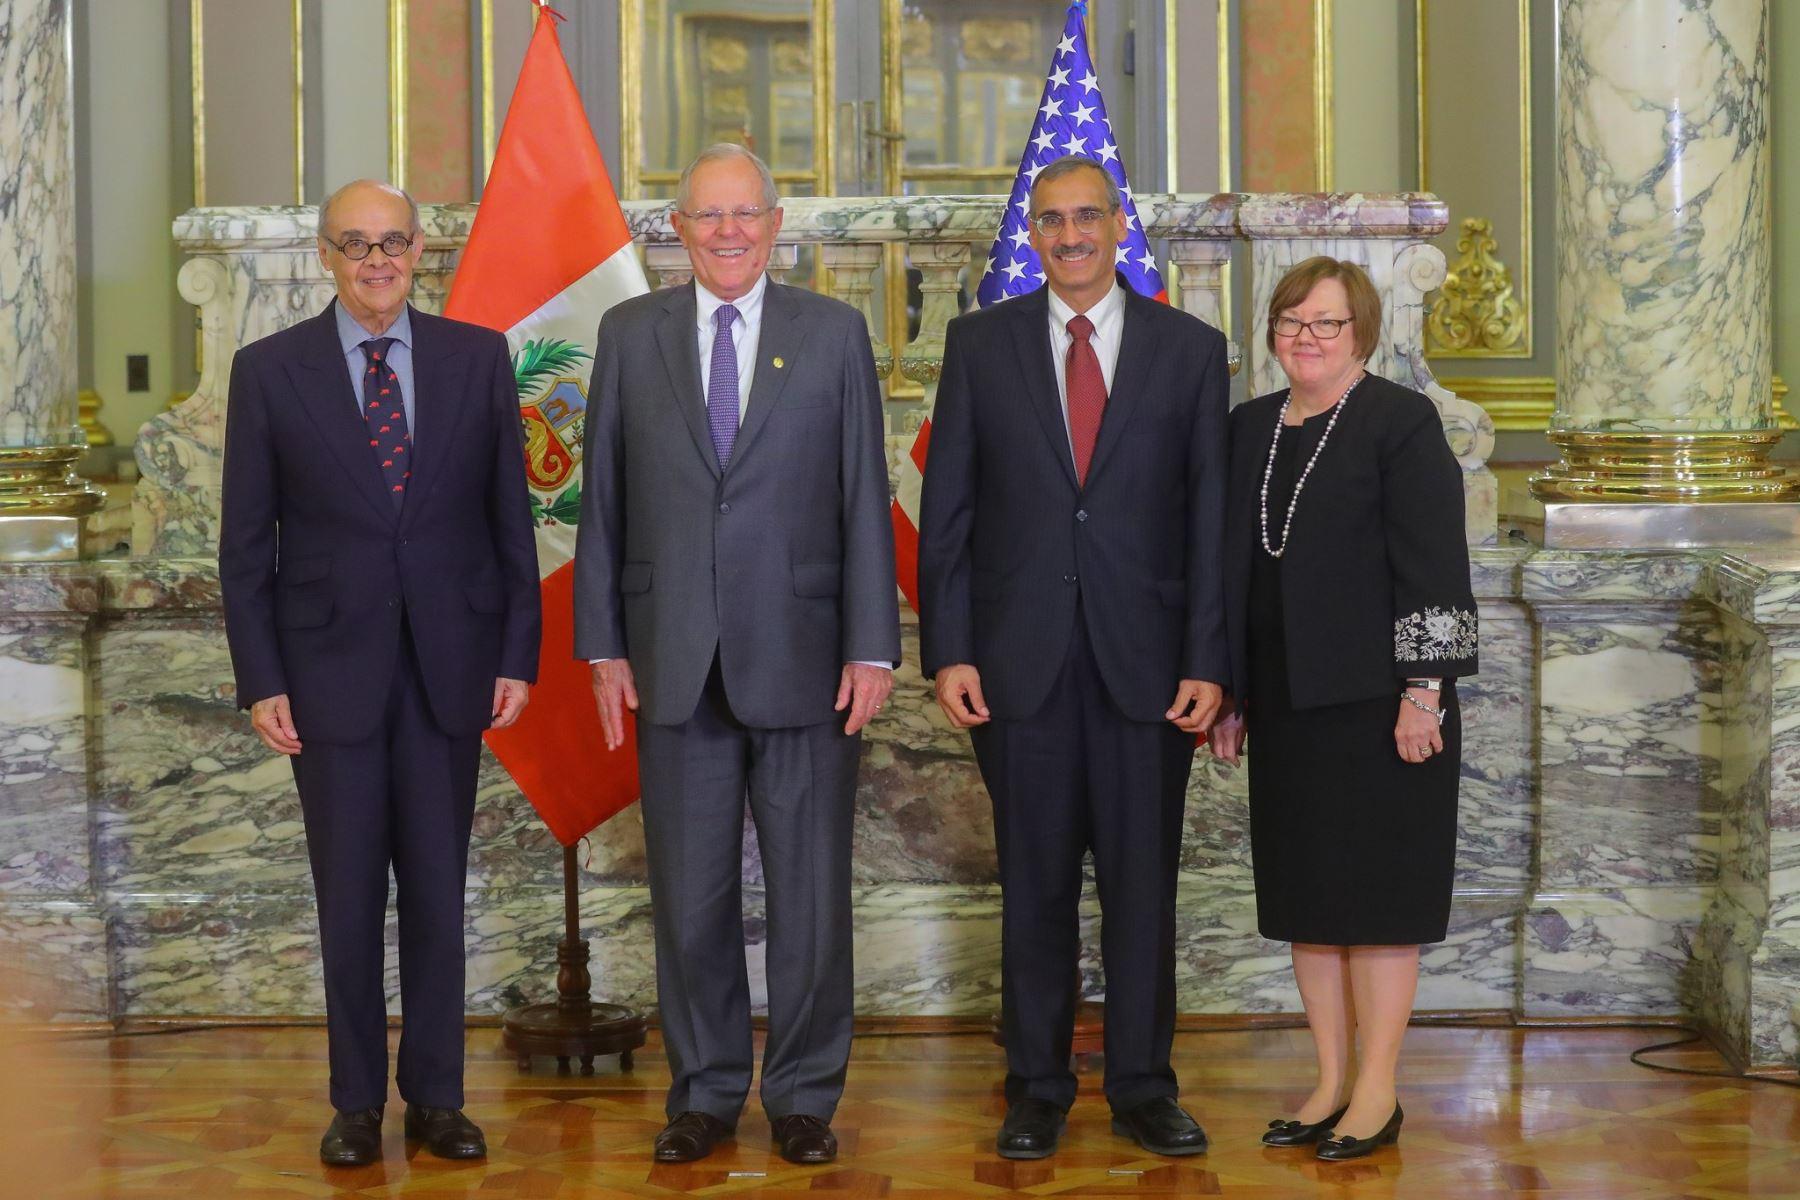 Peru: New US ambassador presents credentials to President Kuczynski